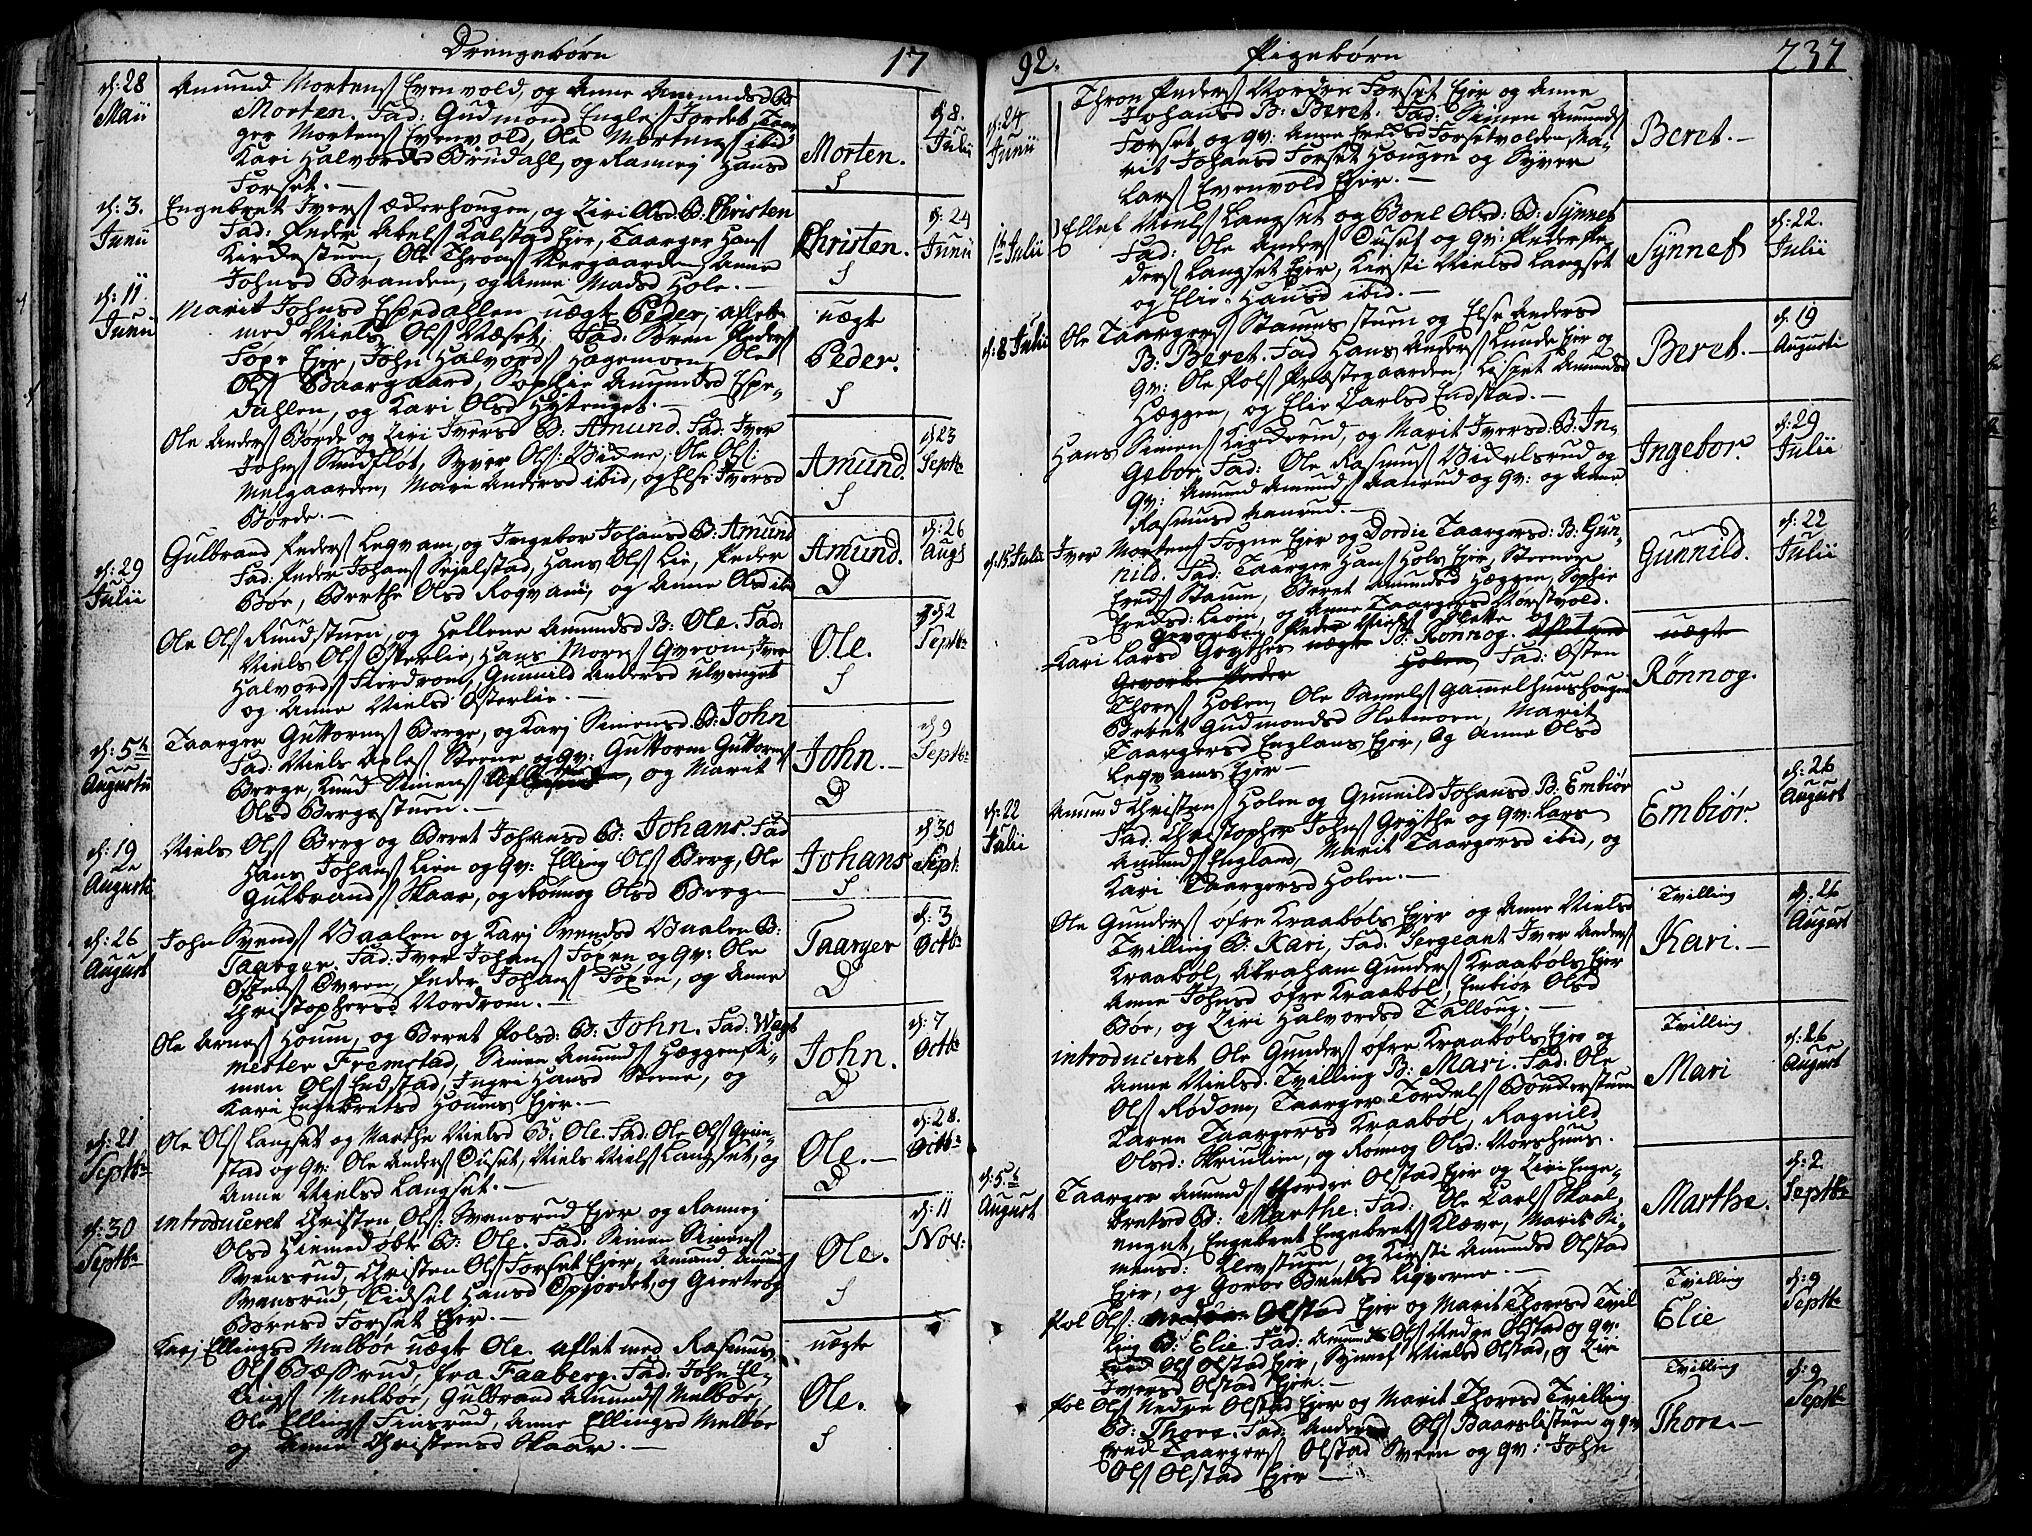 SAH, Gausdal prestekontor, Ministerialbok nr. 3, 1758-1809, s. 237